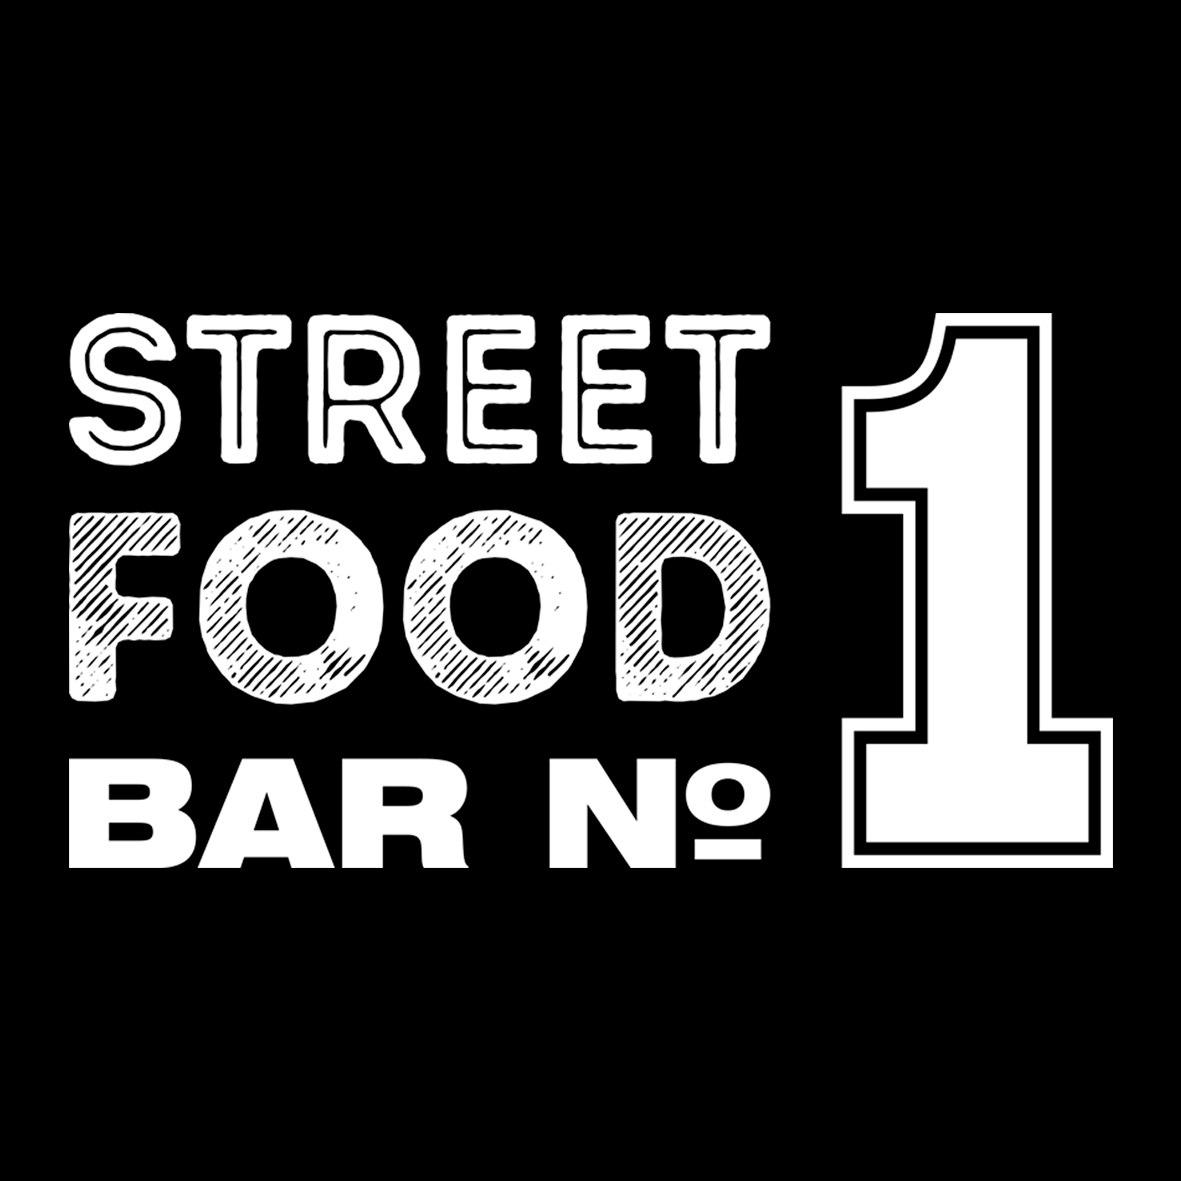 Логотип площадки Street Food Bar № 1